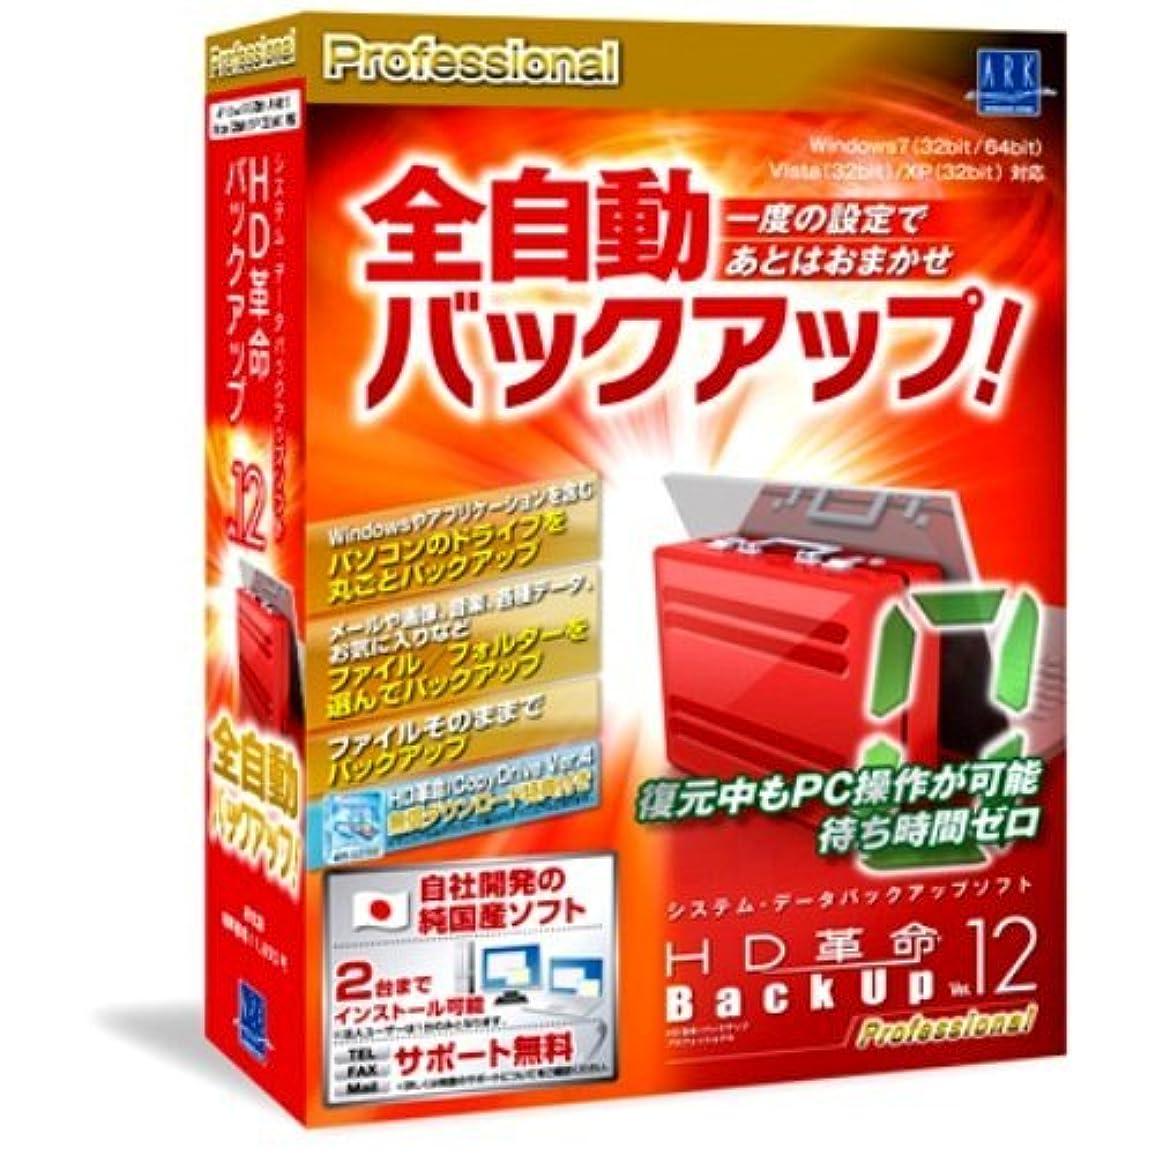 HD革命/BackUp Ver.12 Professional 通常版